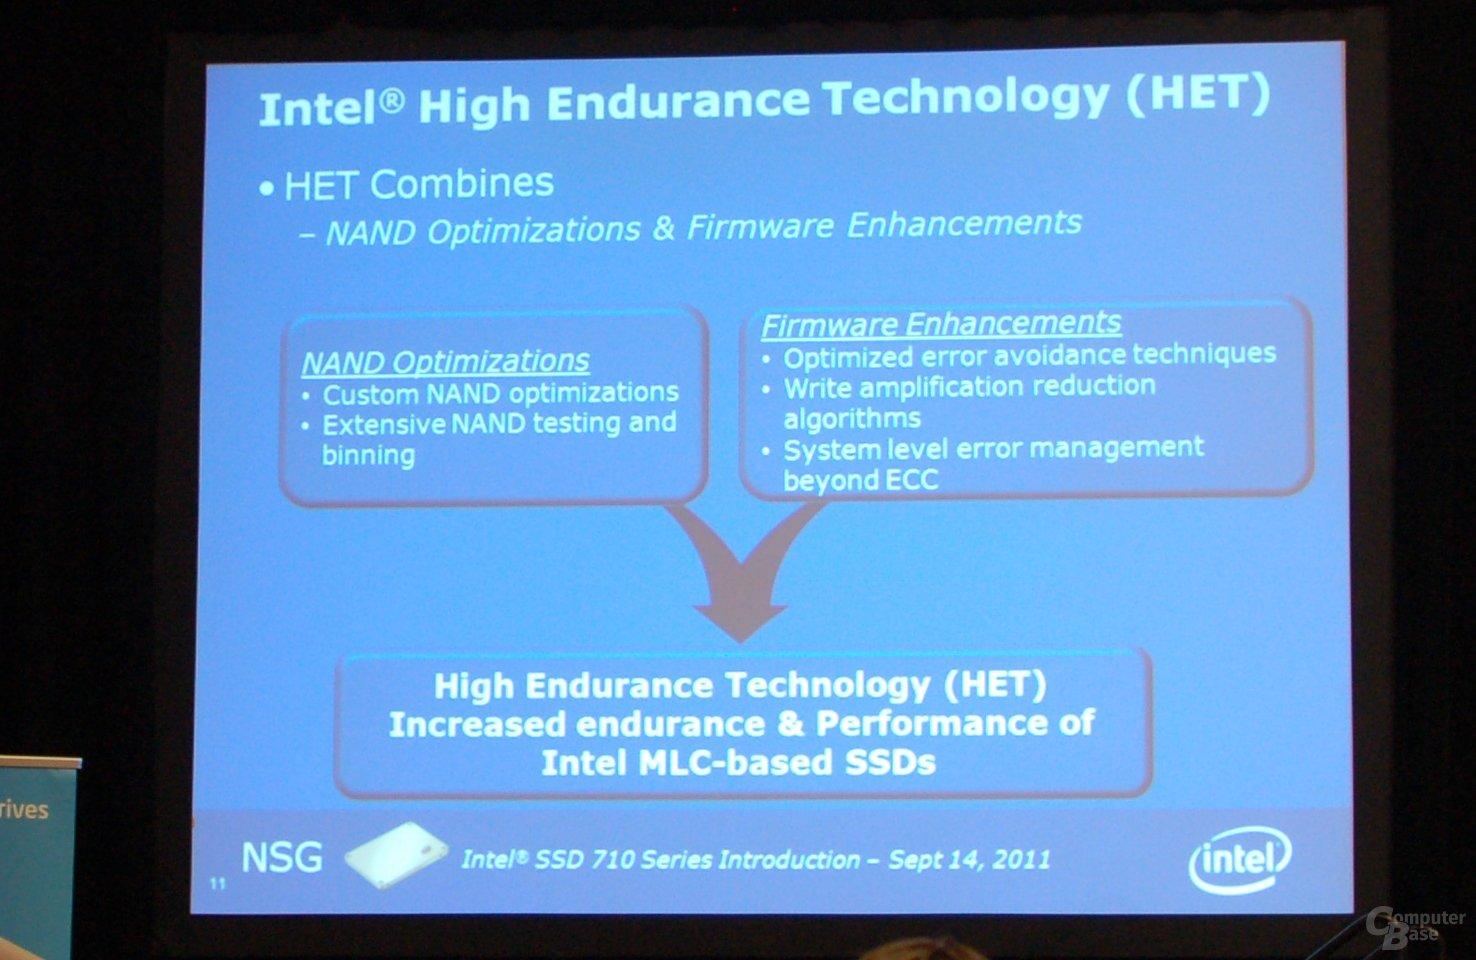 Intel High Endurance Technology